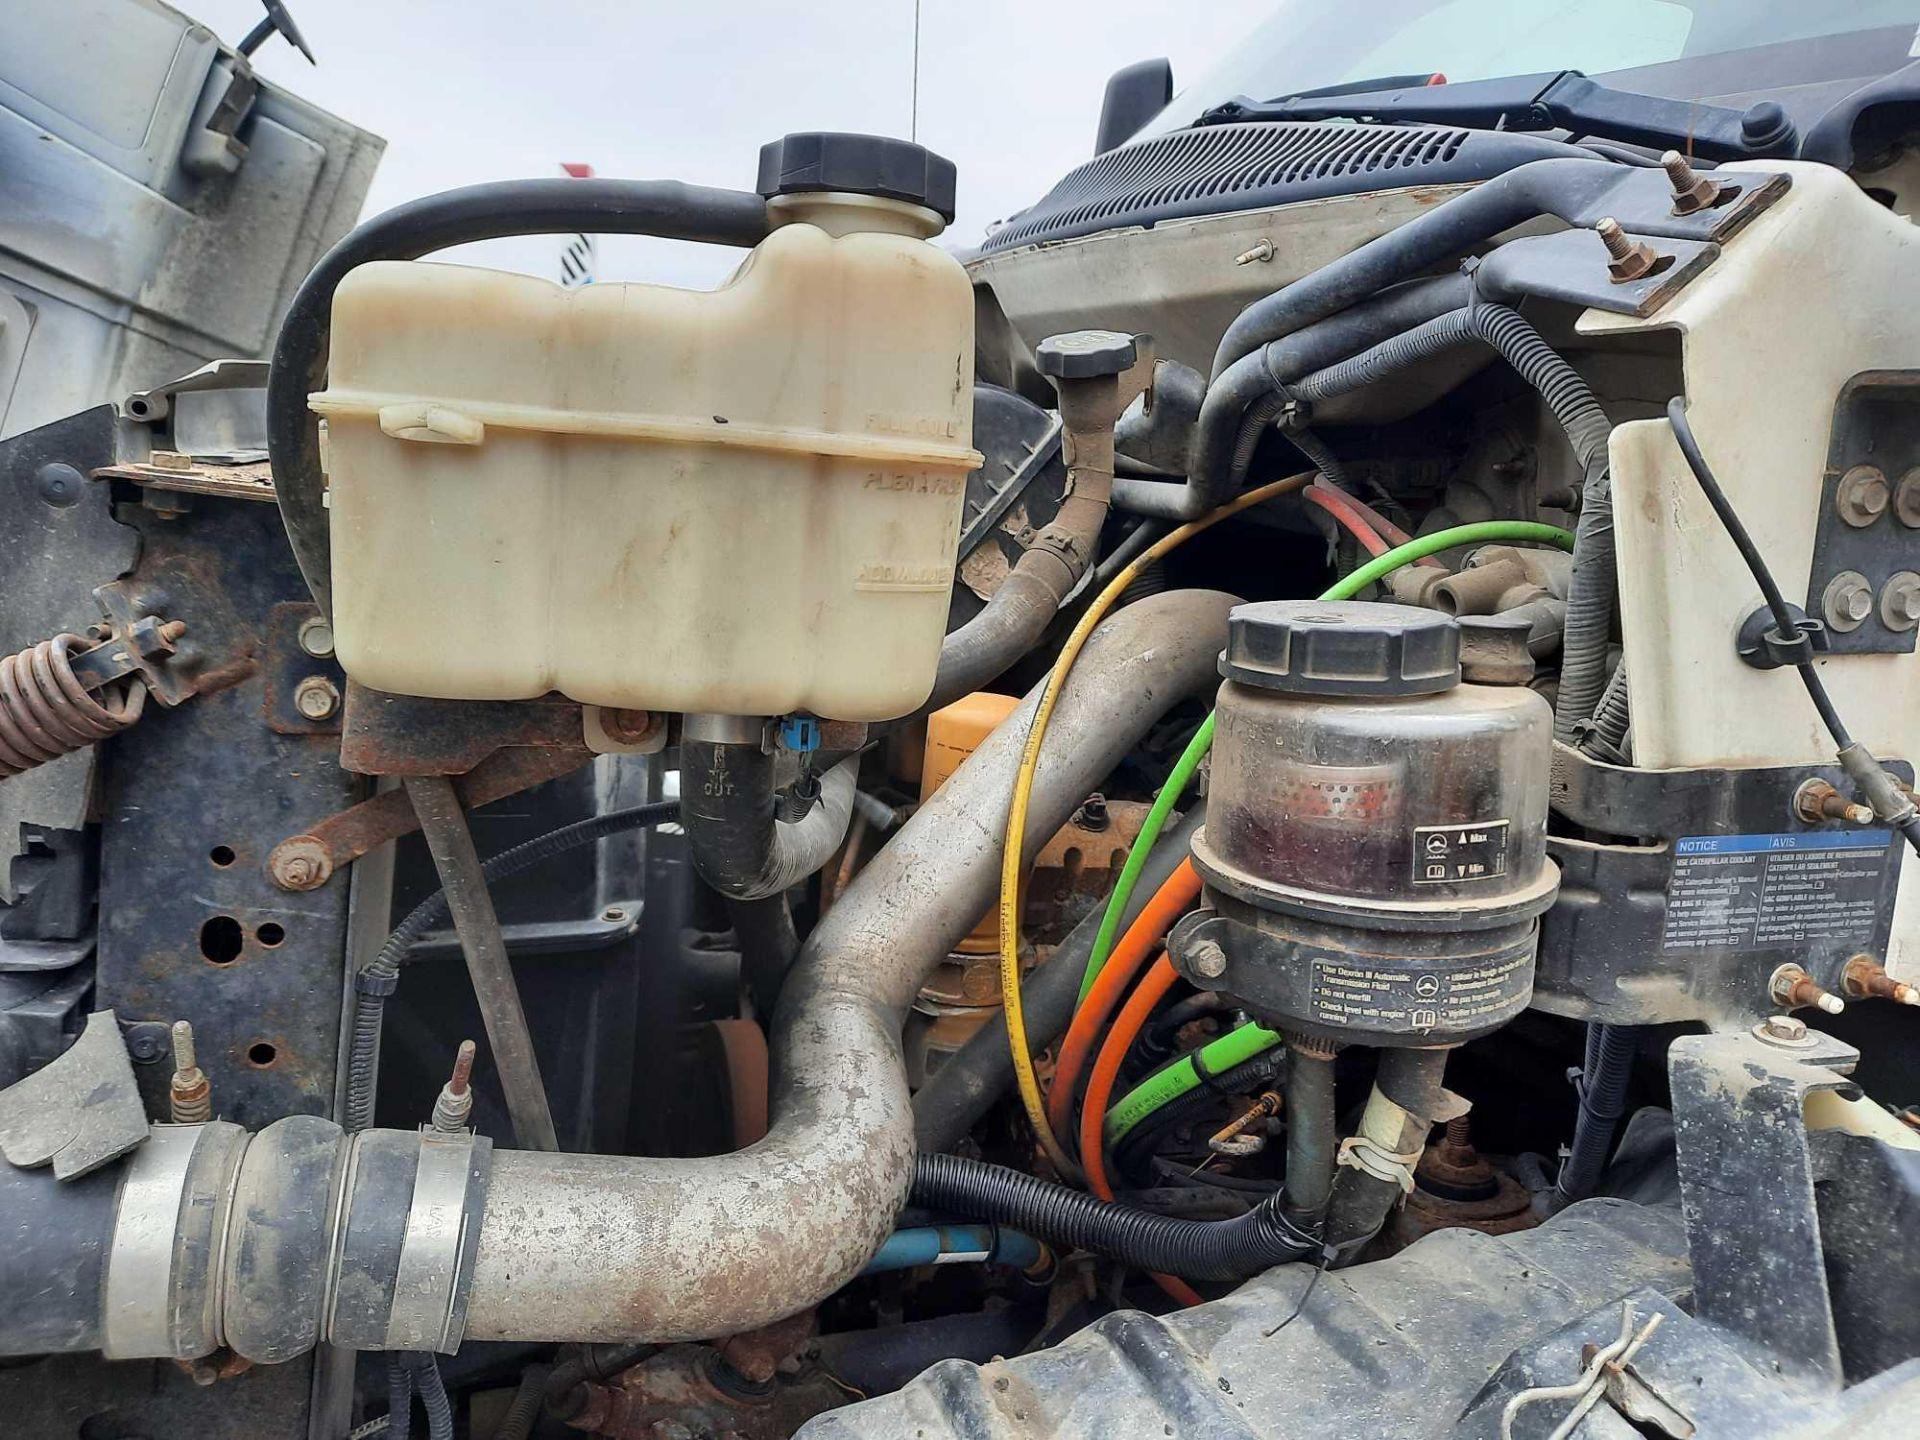 2005 GMC 7500 10' DUMP TRUCK (VDOT UNIT #: R07219) - Image 6 of 16